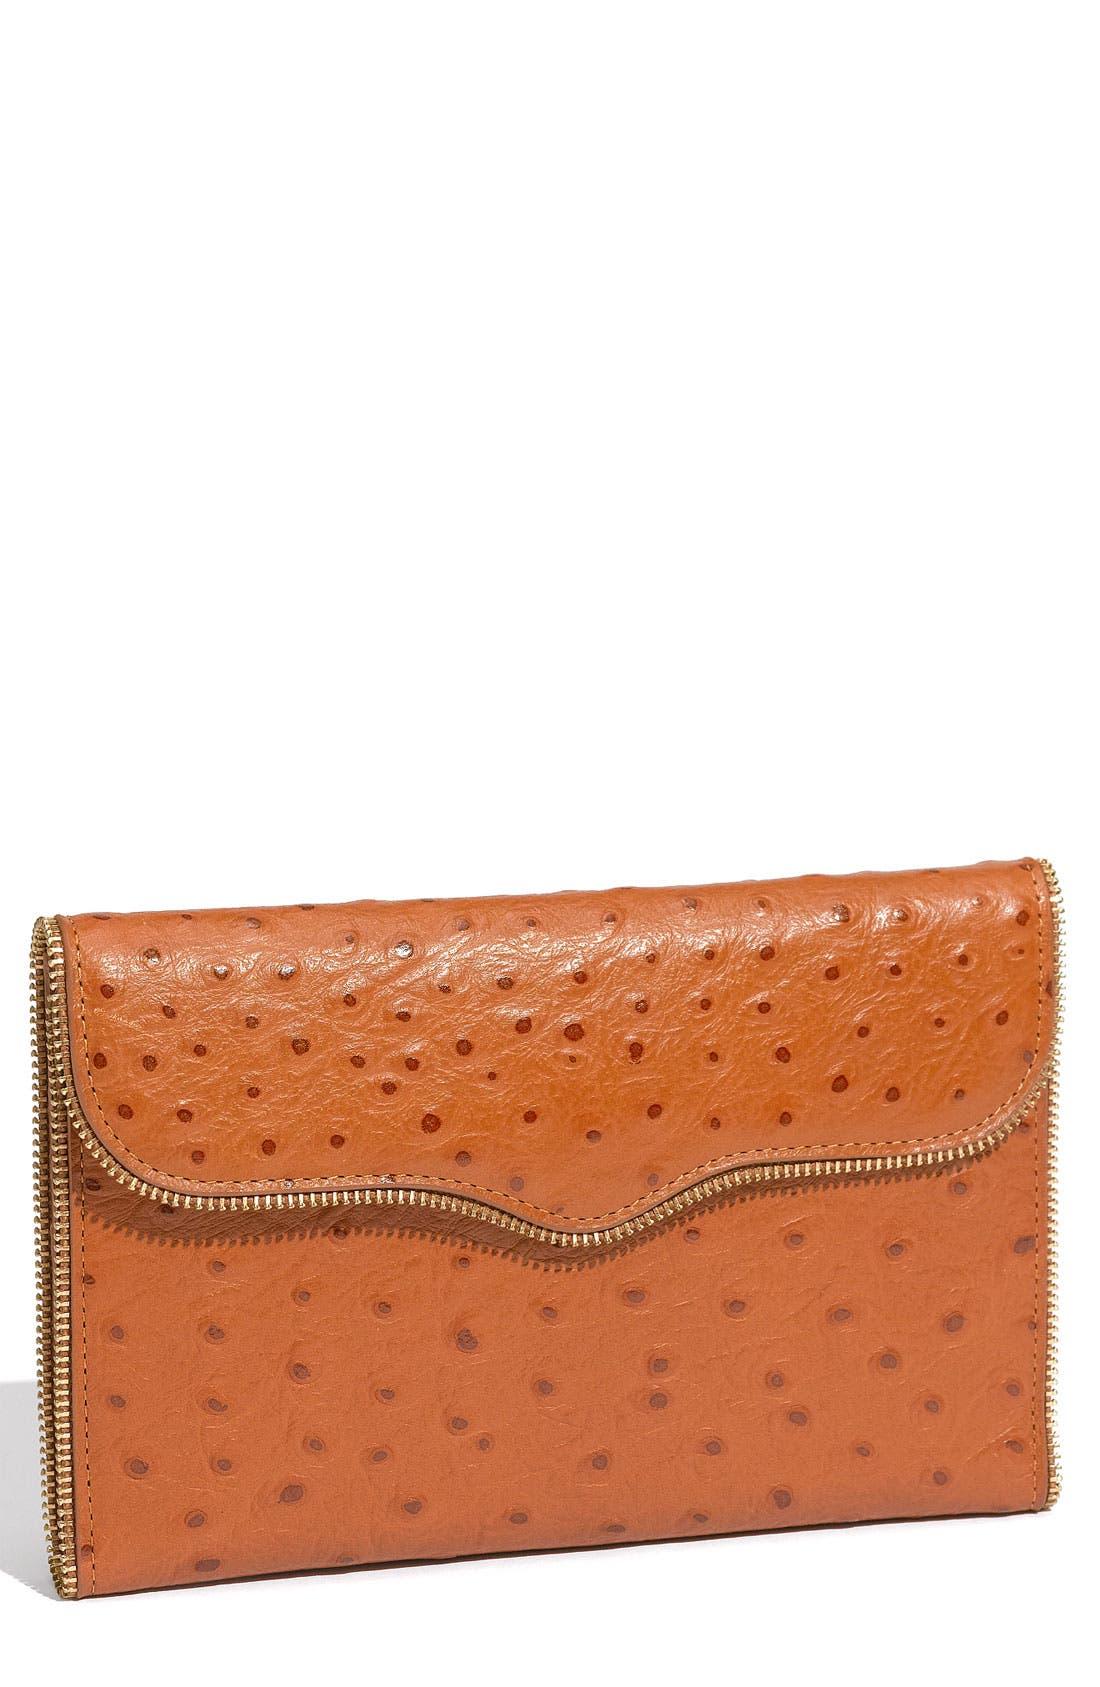 Alternate Image 1 Selected - Rebecca Minkoff 'Passport' Ostrich Embossed Flap Wallet